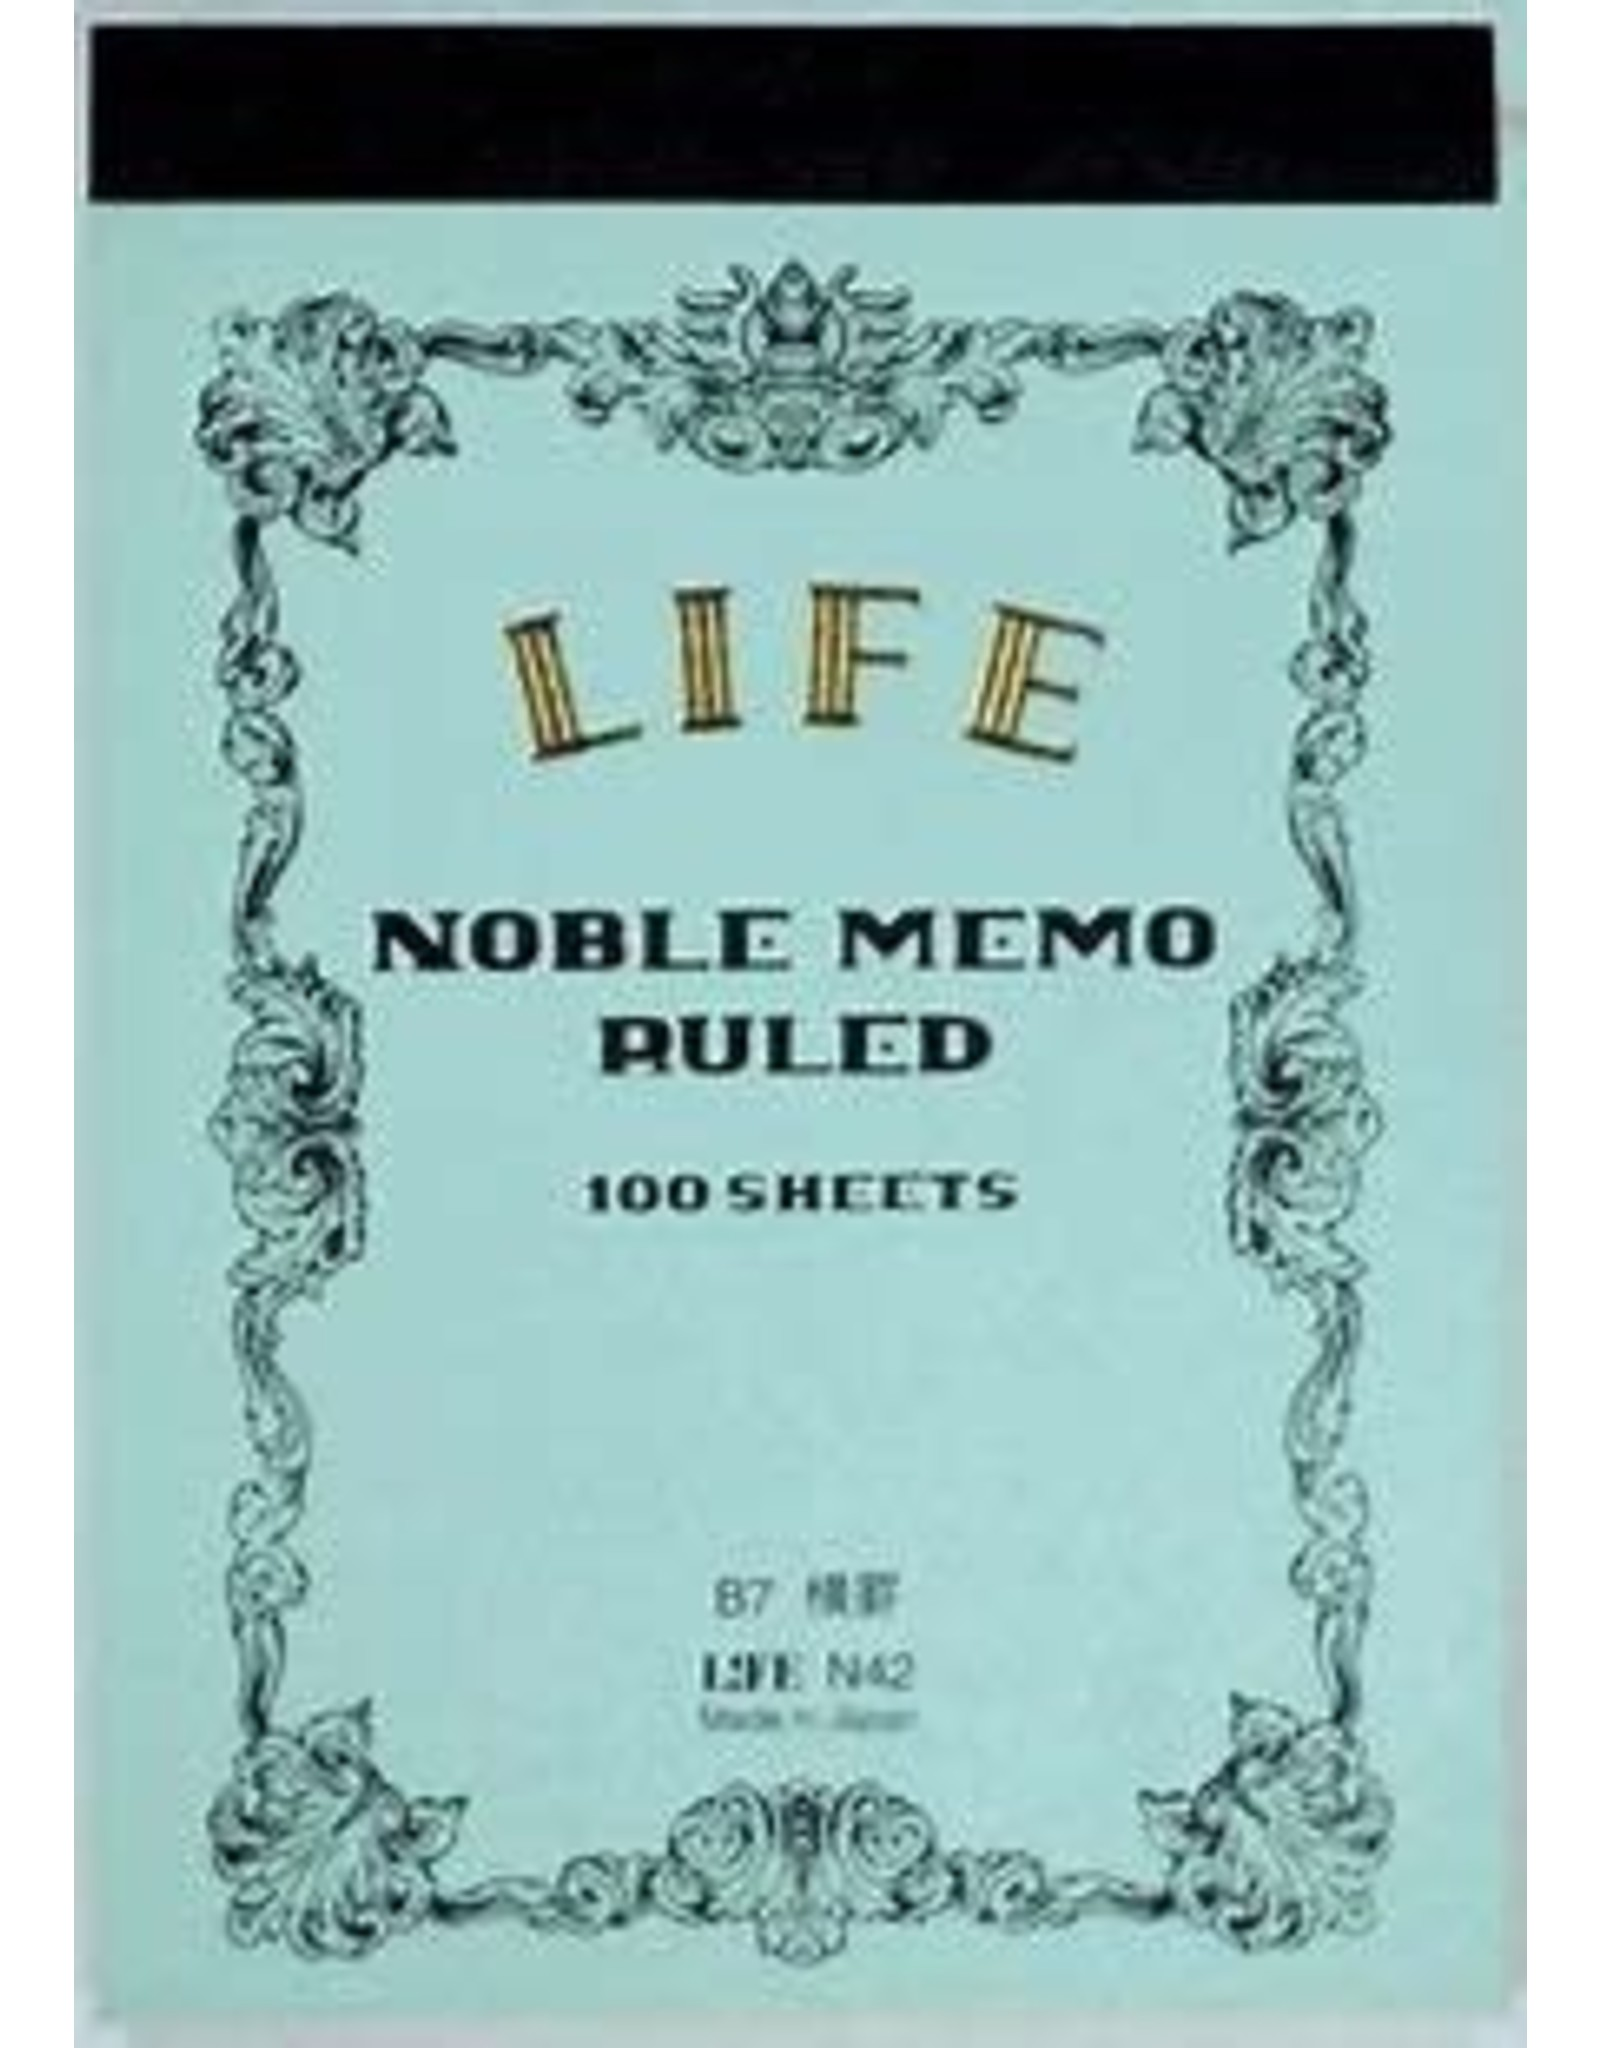 LIFE CO.,LTD. NOBLE MEMO RULED